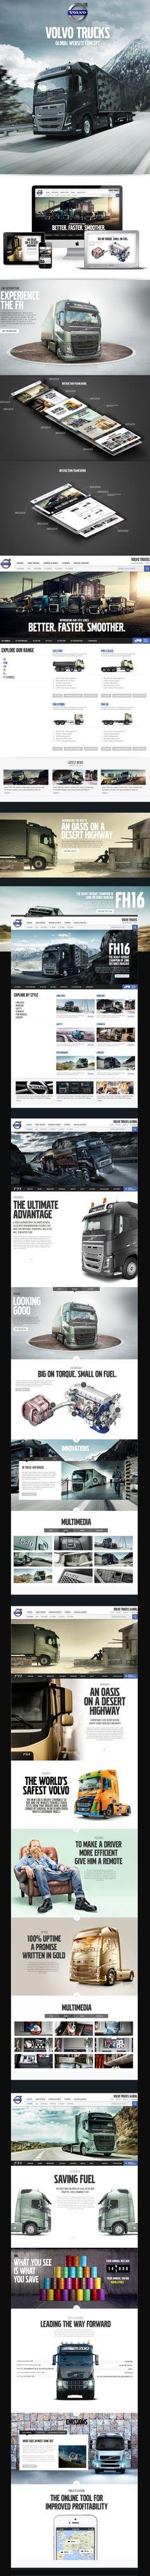 Volvo Truck Redesign  http://www.behance.net/gallery/Volvo-Trucks-Global-Website/13097021